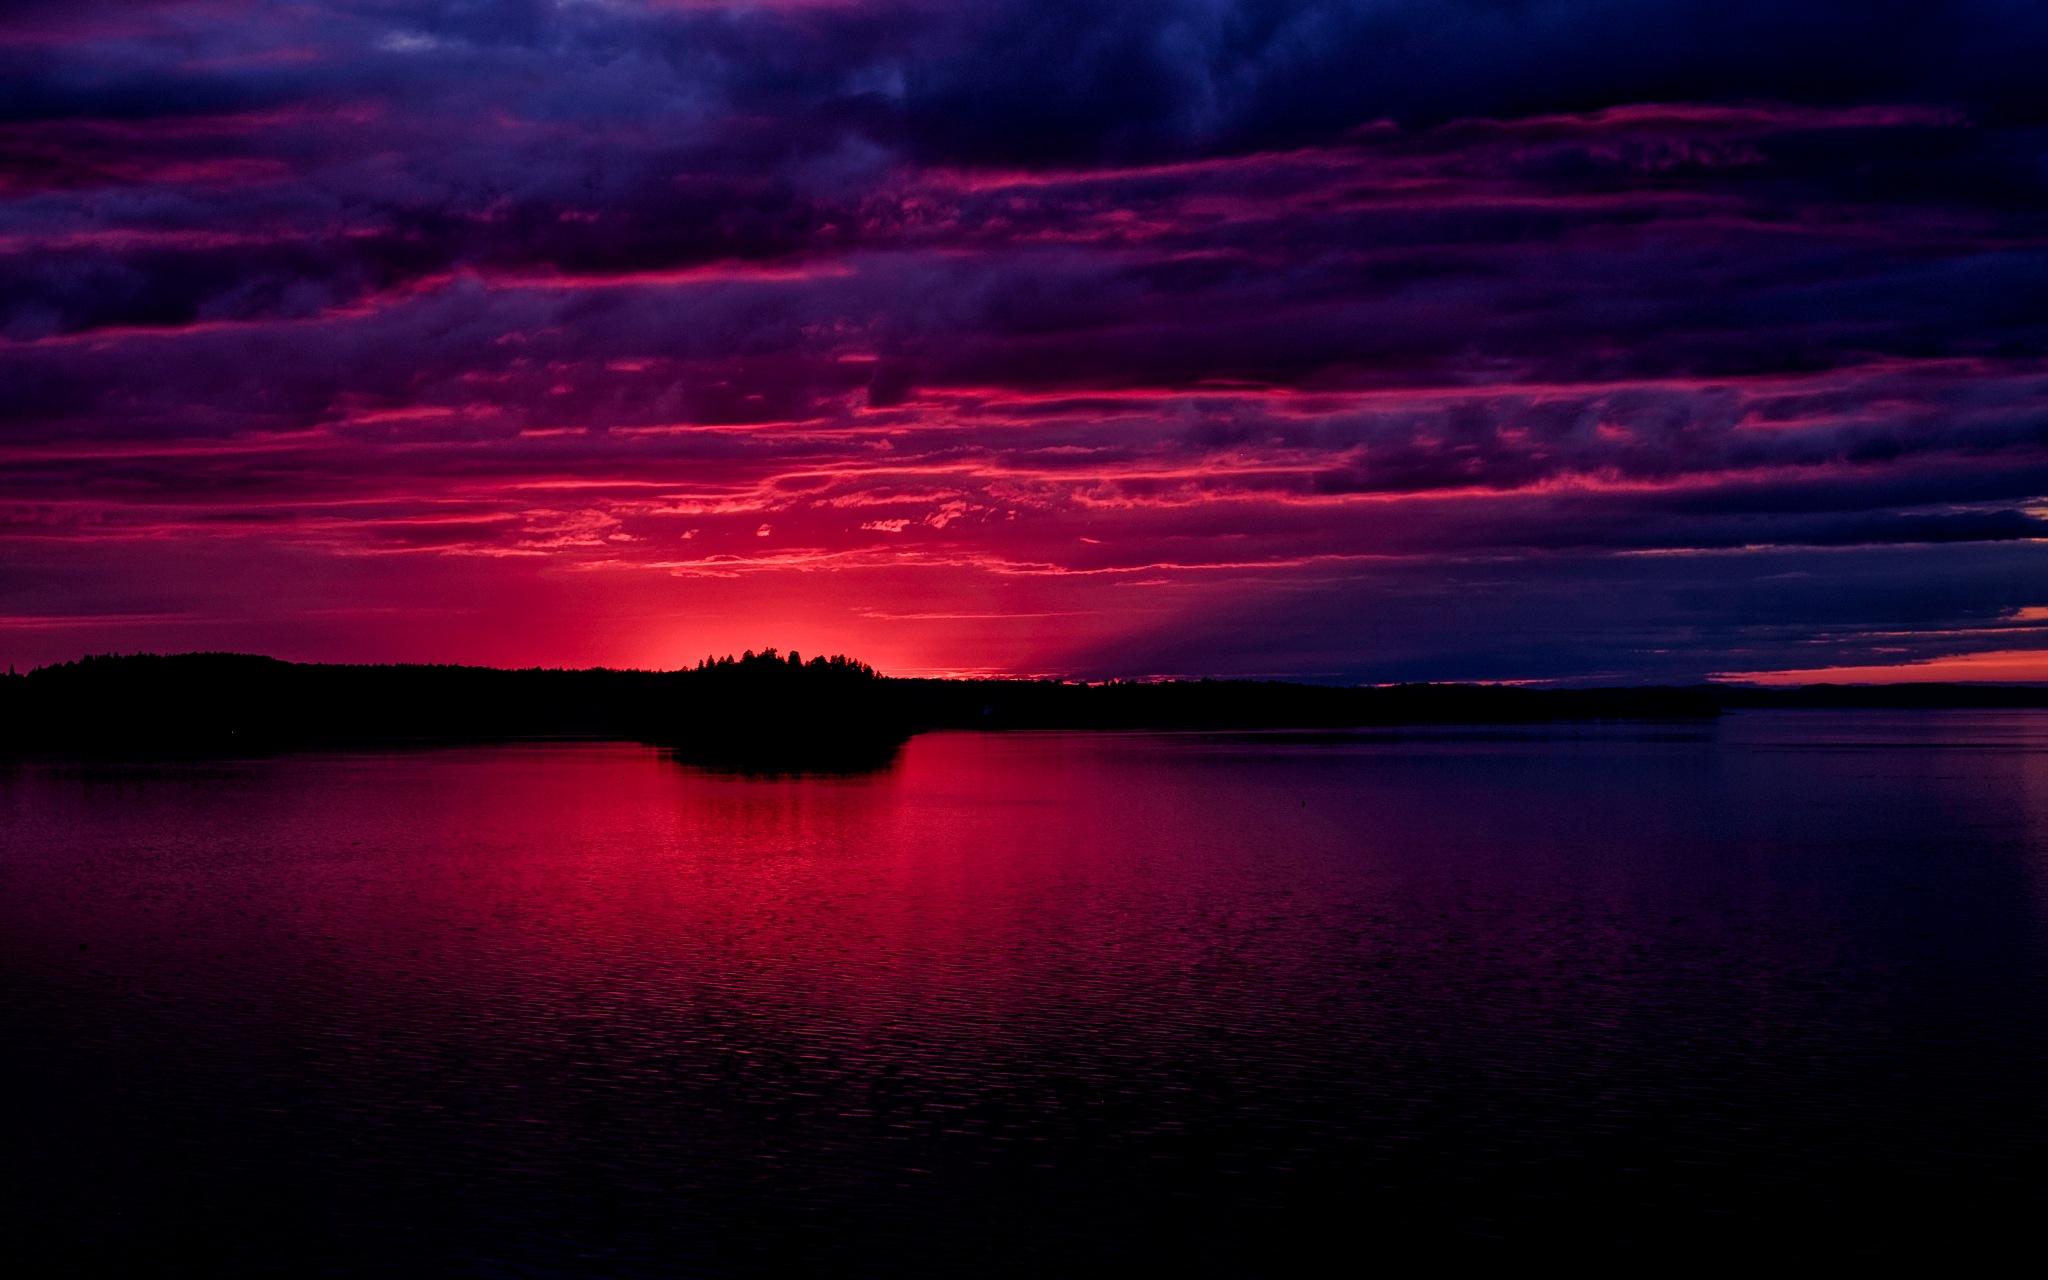 Magenta Sunset by Nick Mirkovich